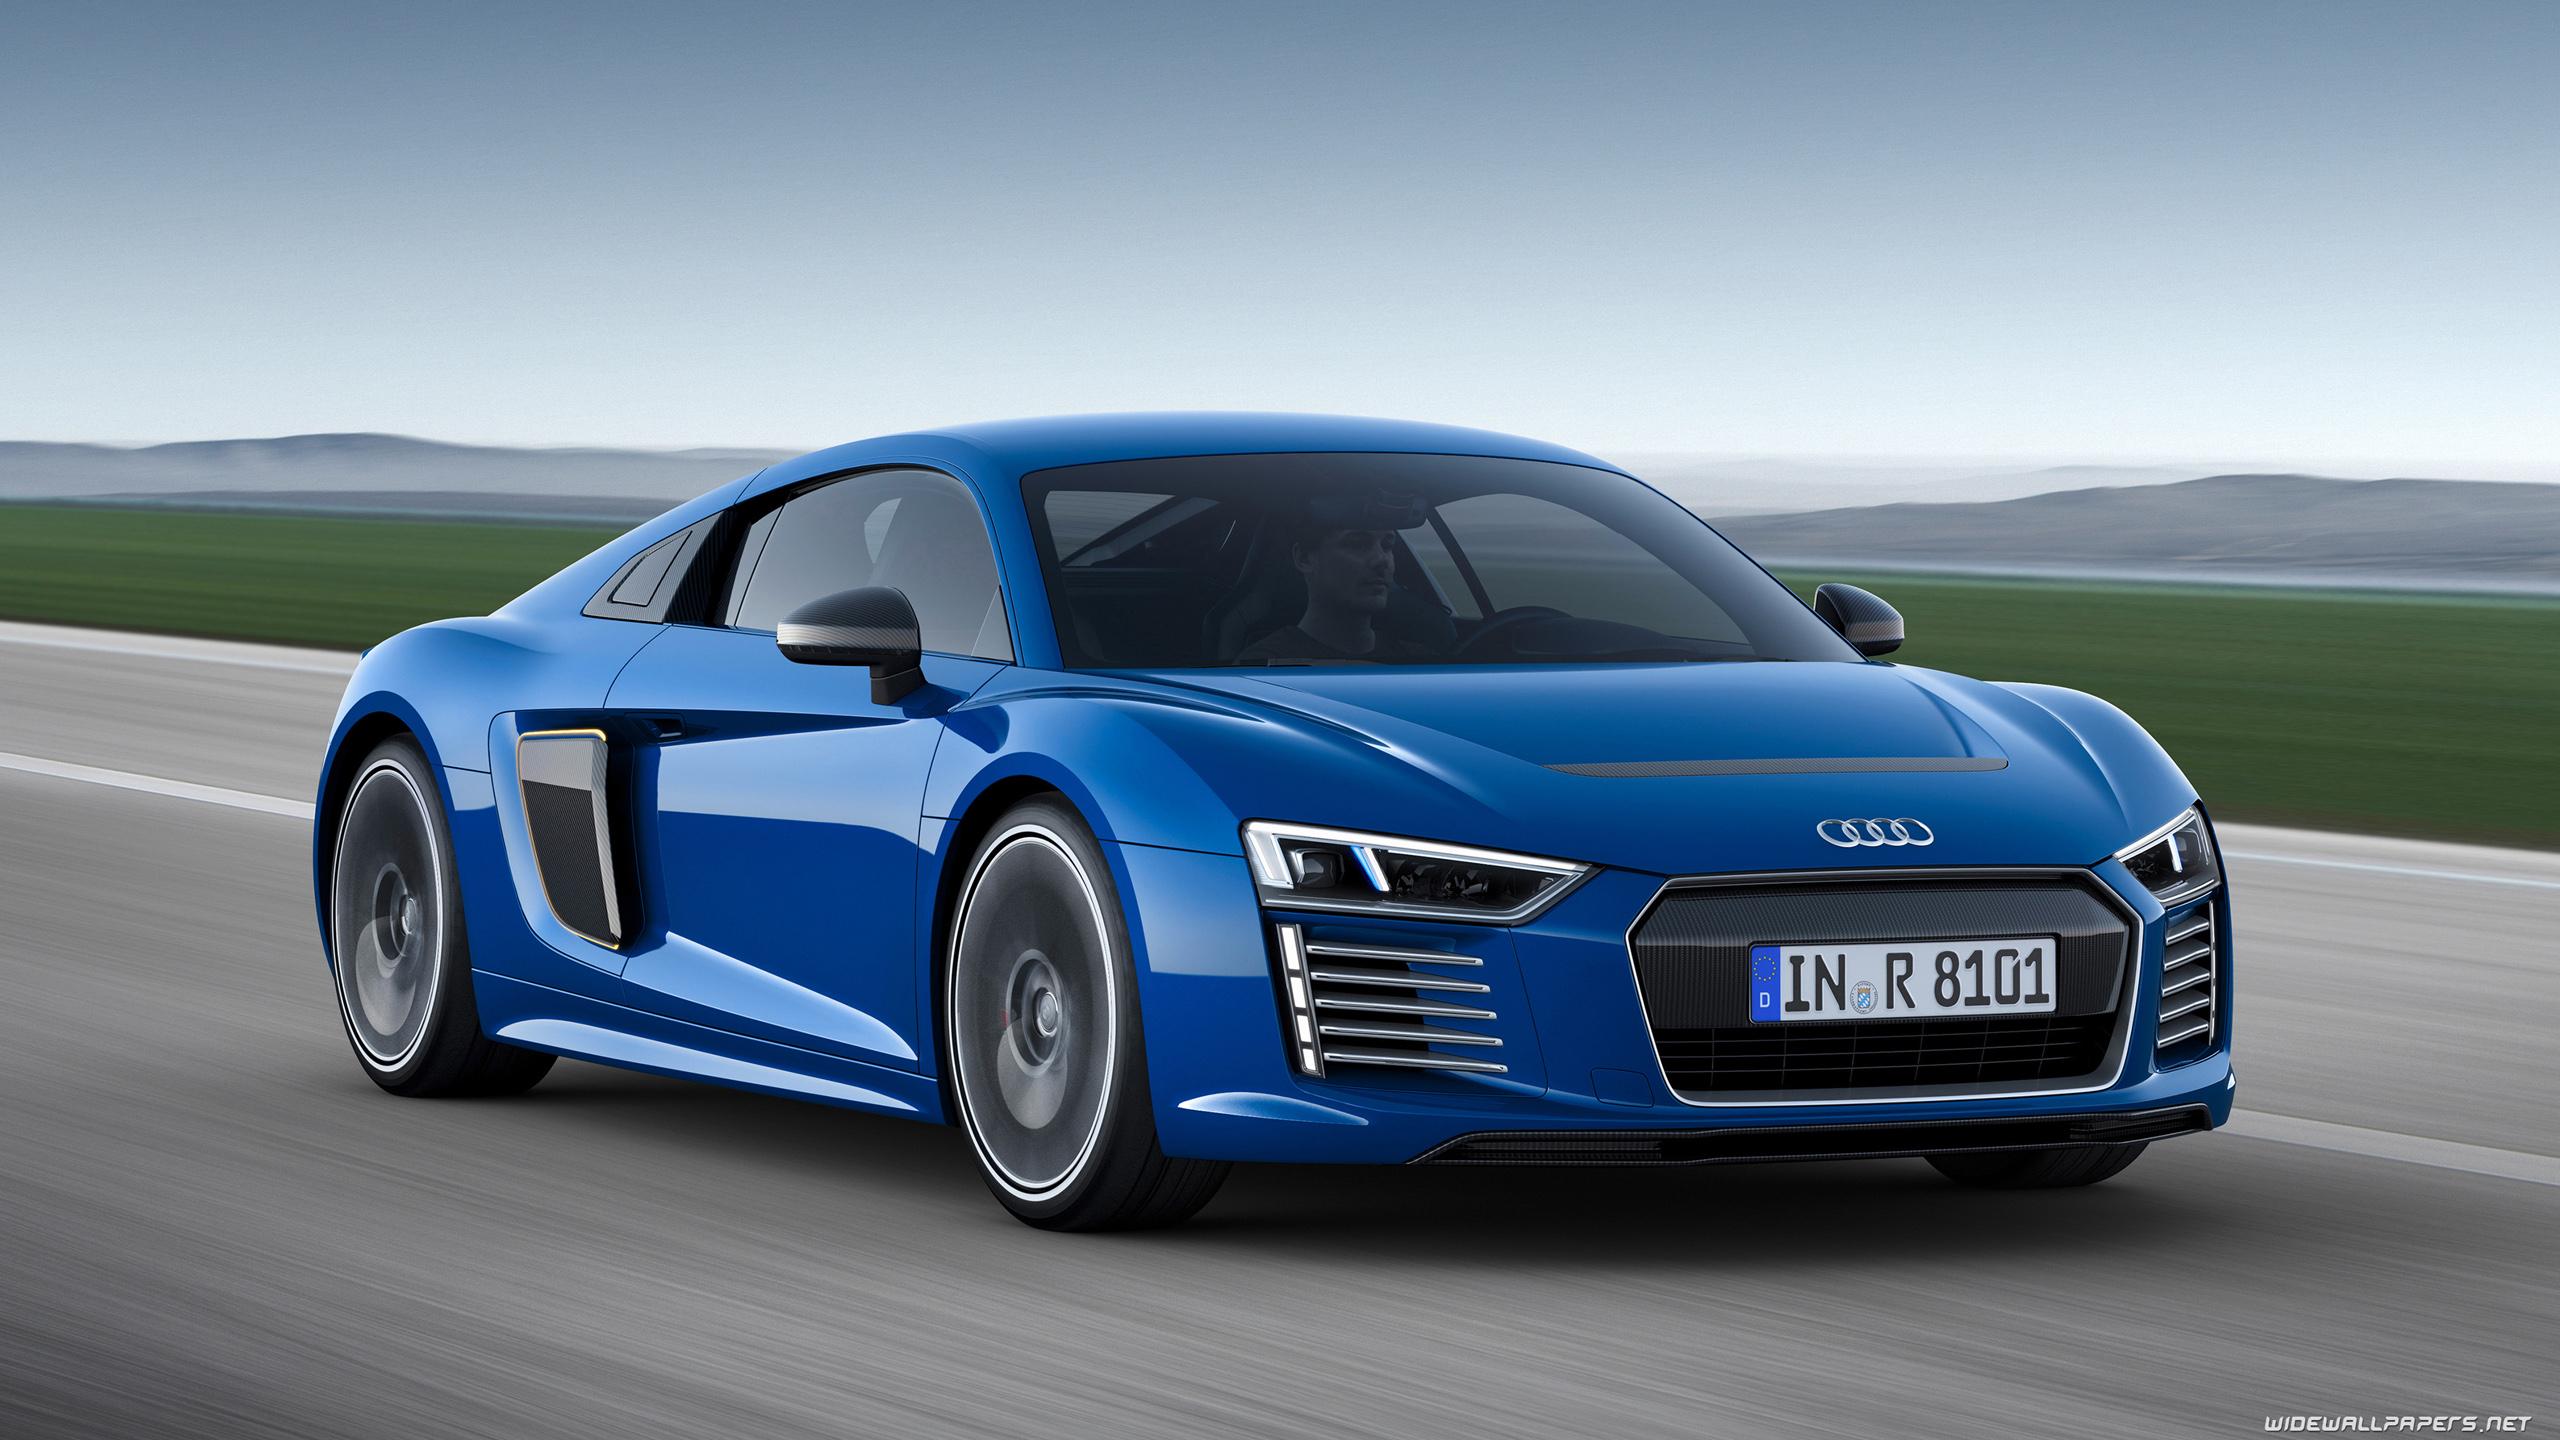 Audi R8 cars desktop wallpapers 4K Ultra HD 2560x1440